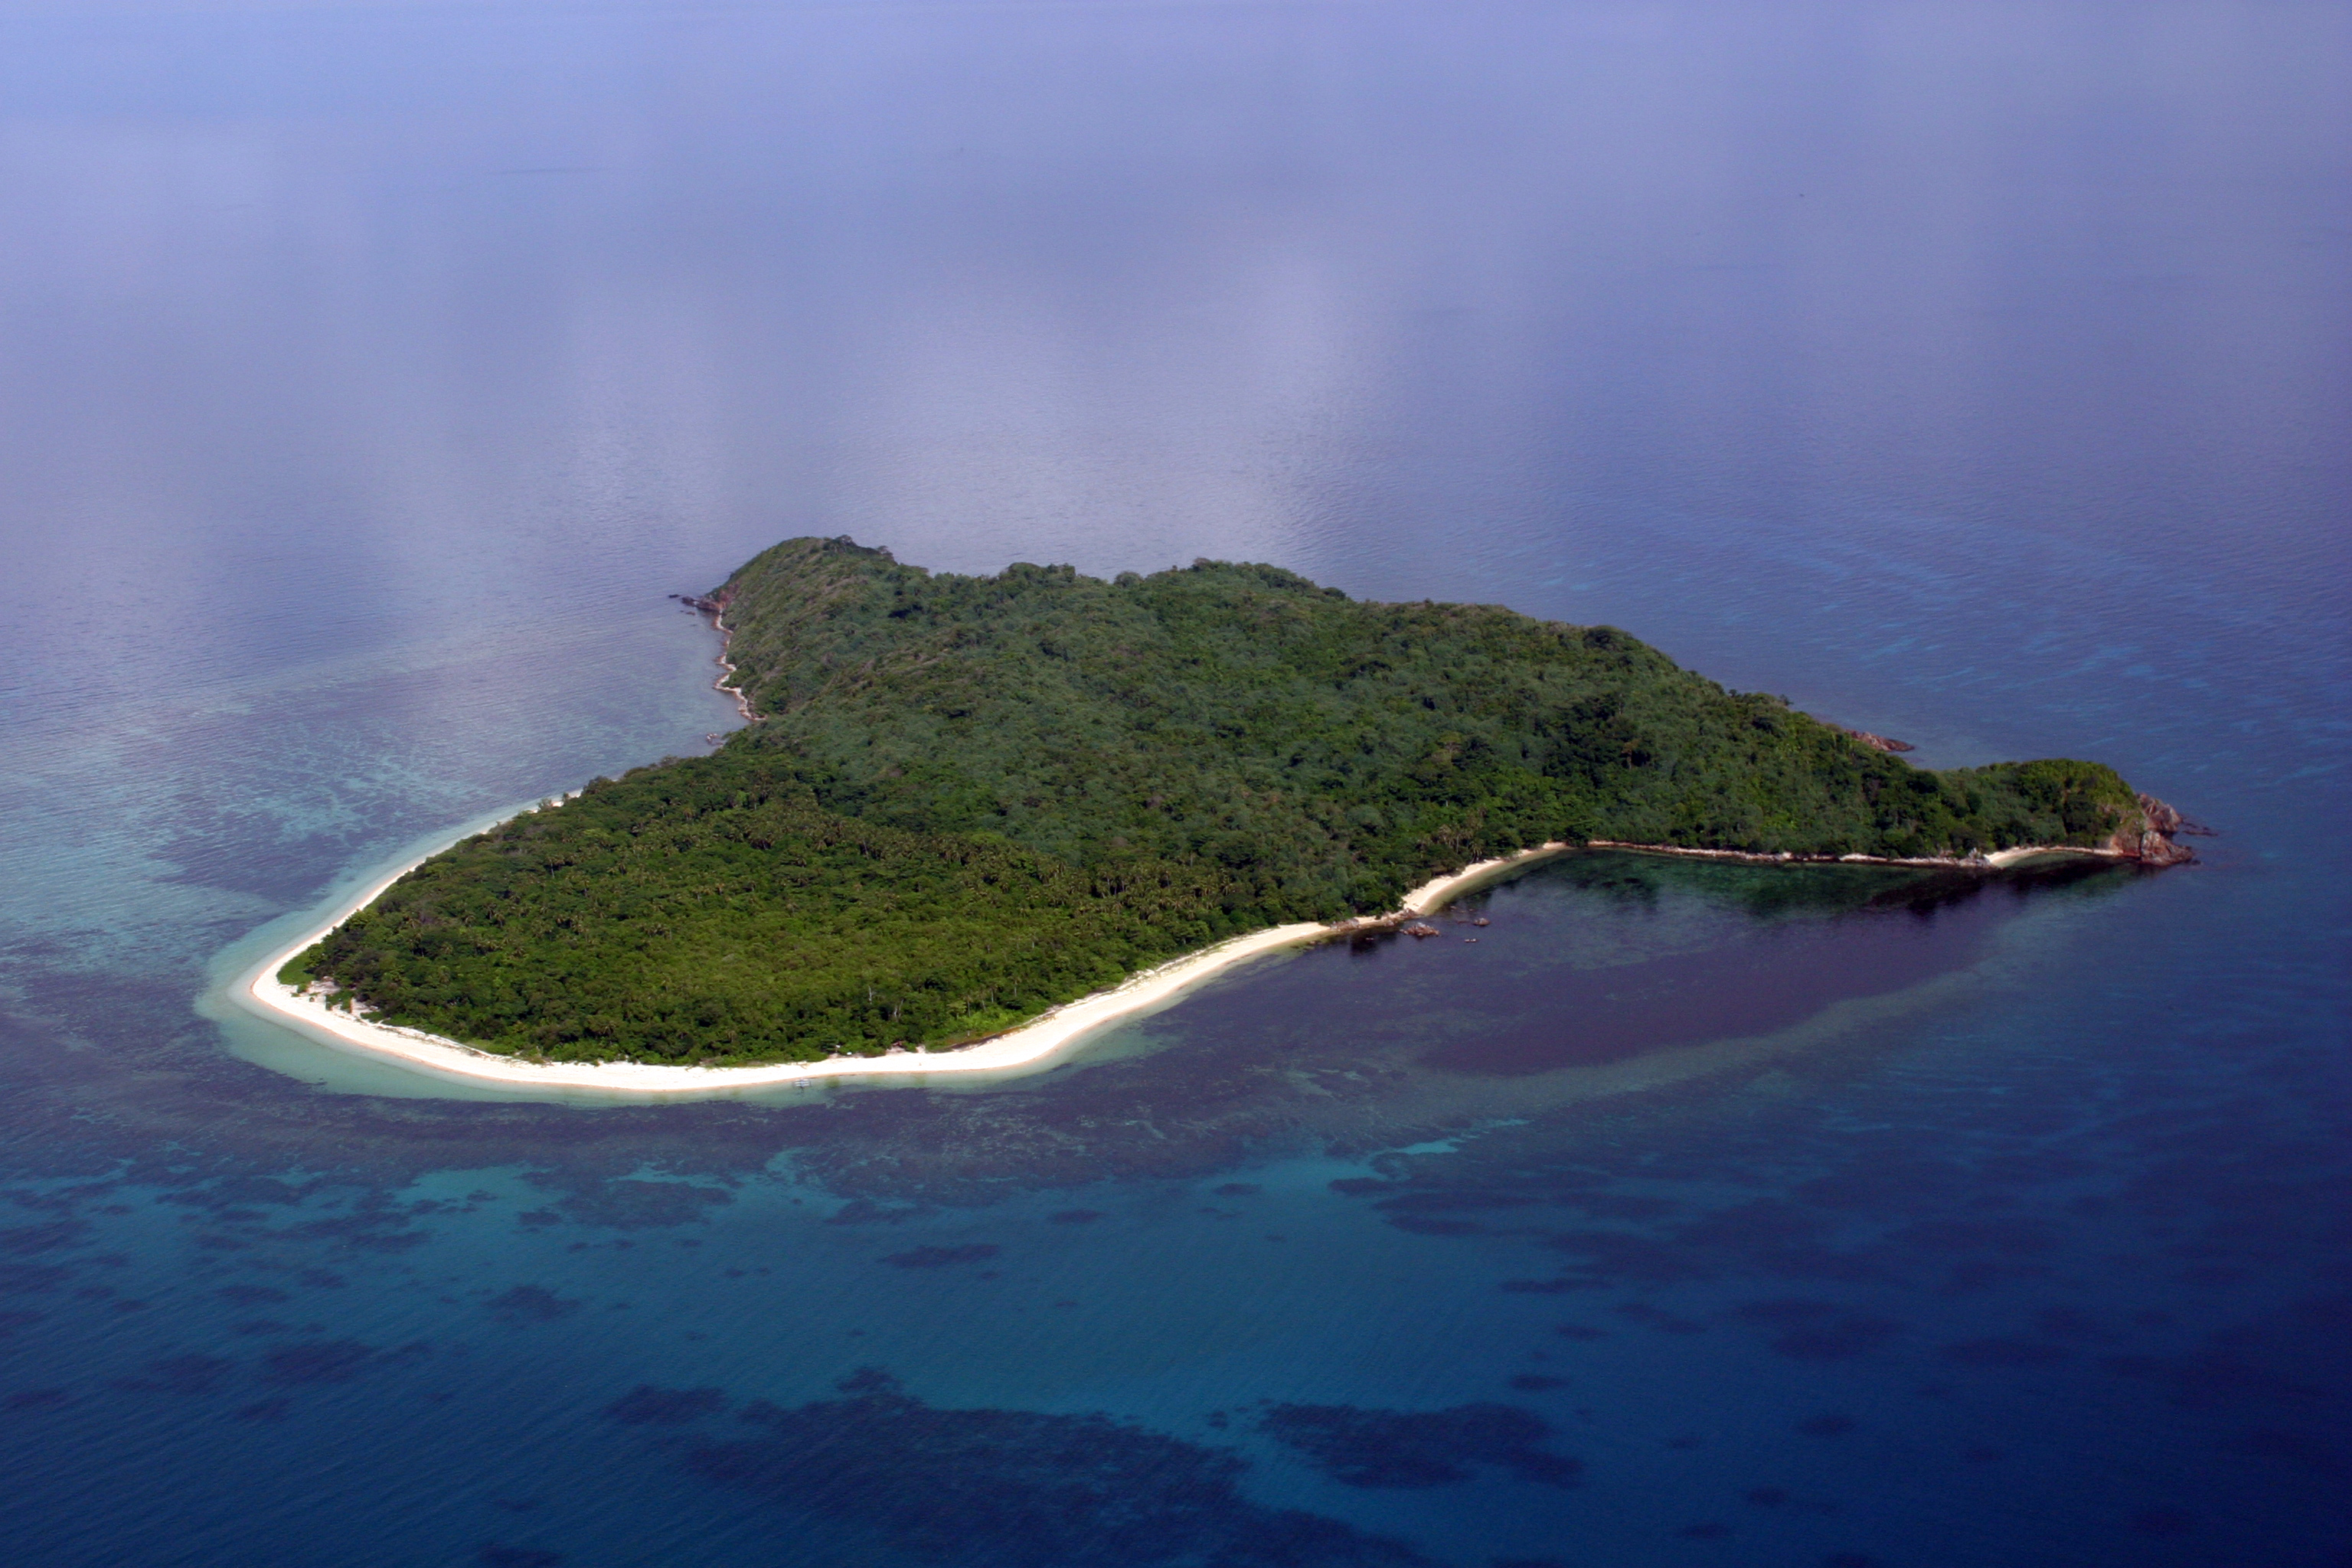 island-aerial-c-morrison